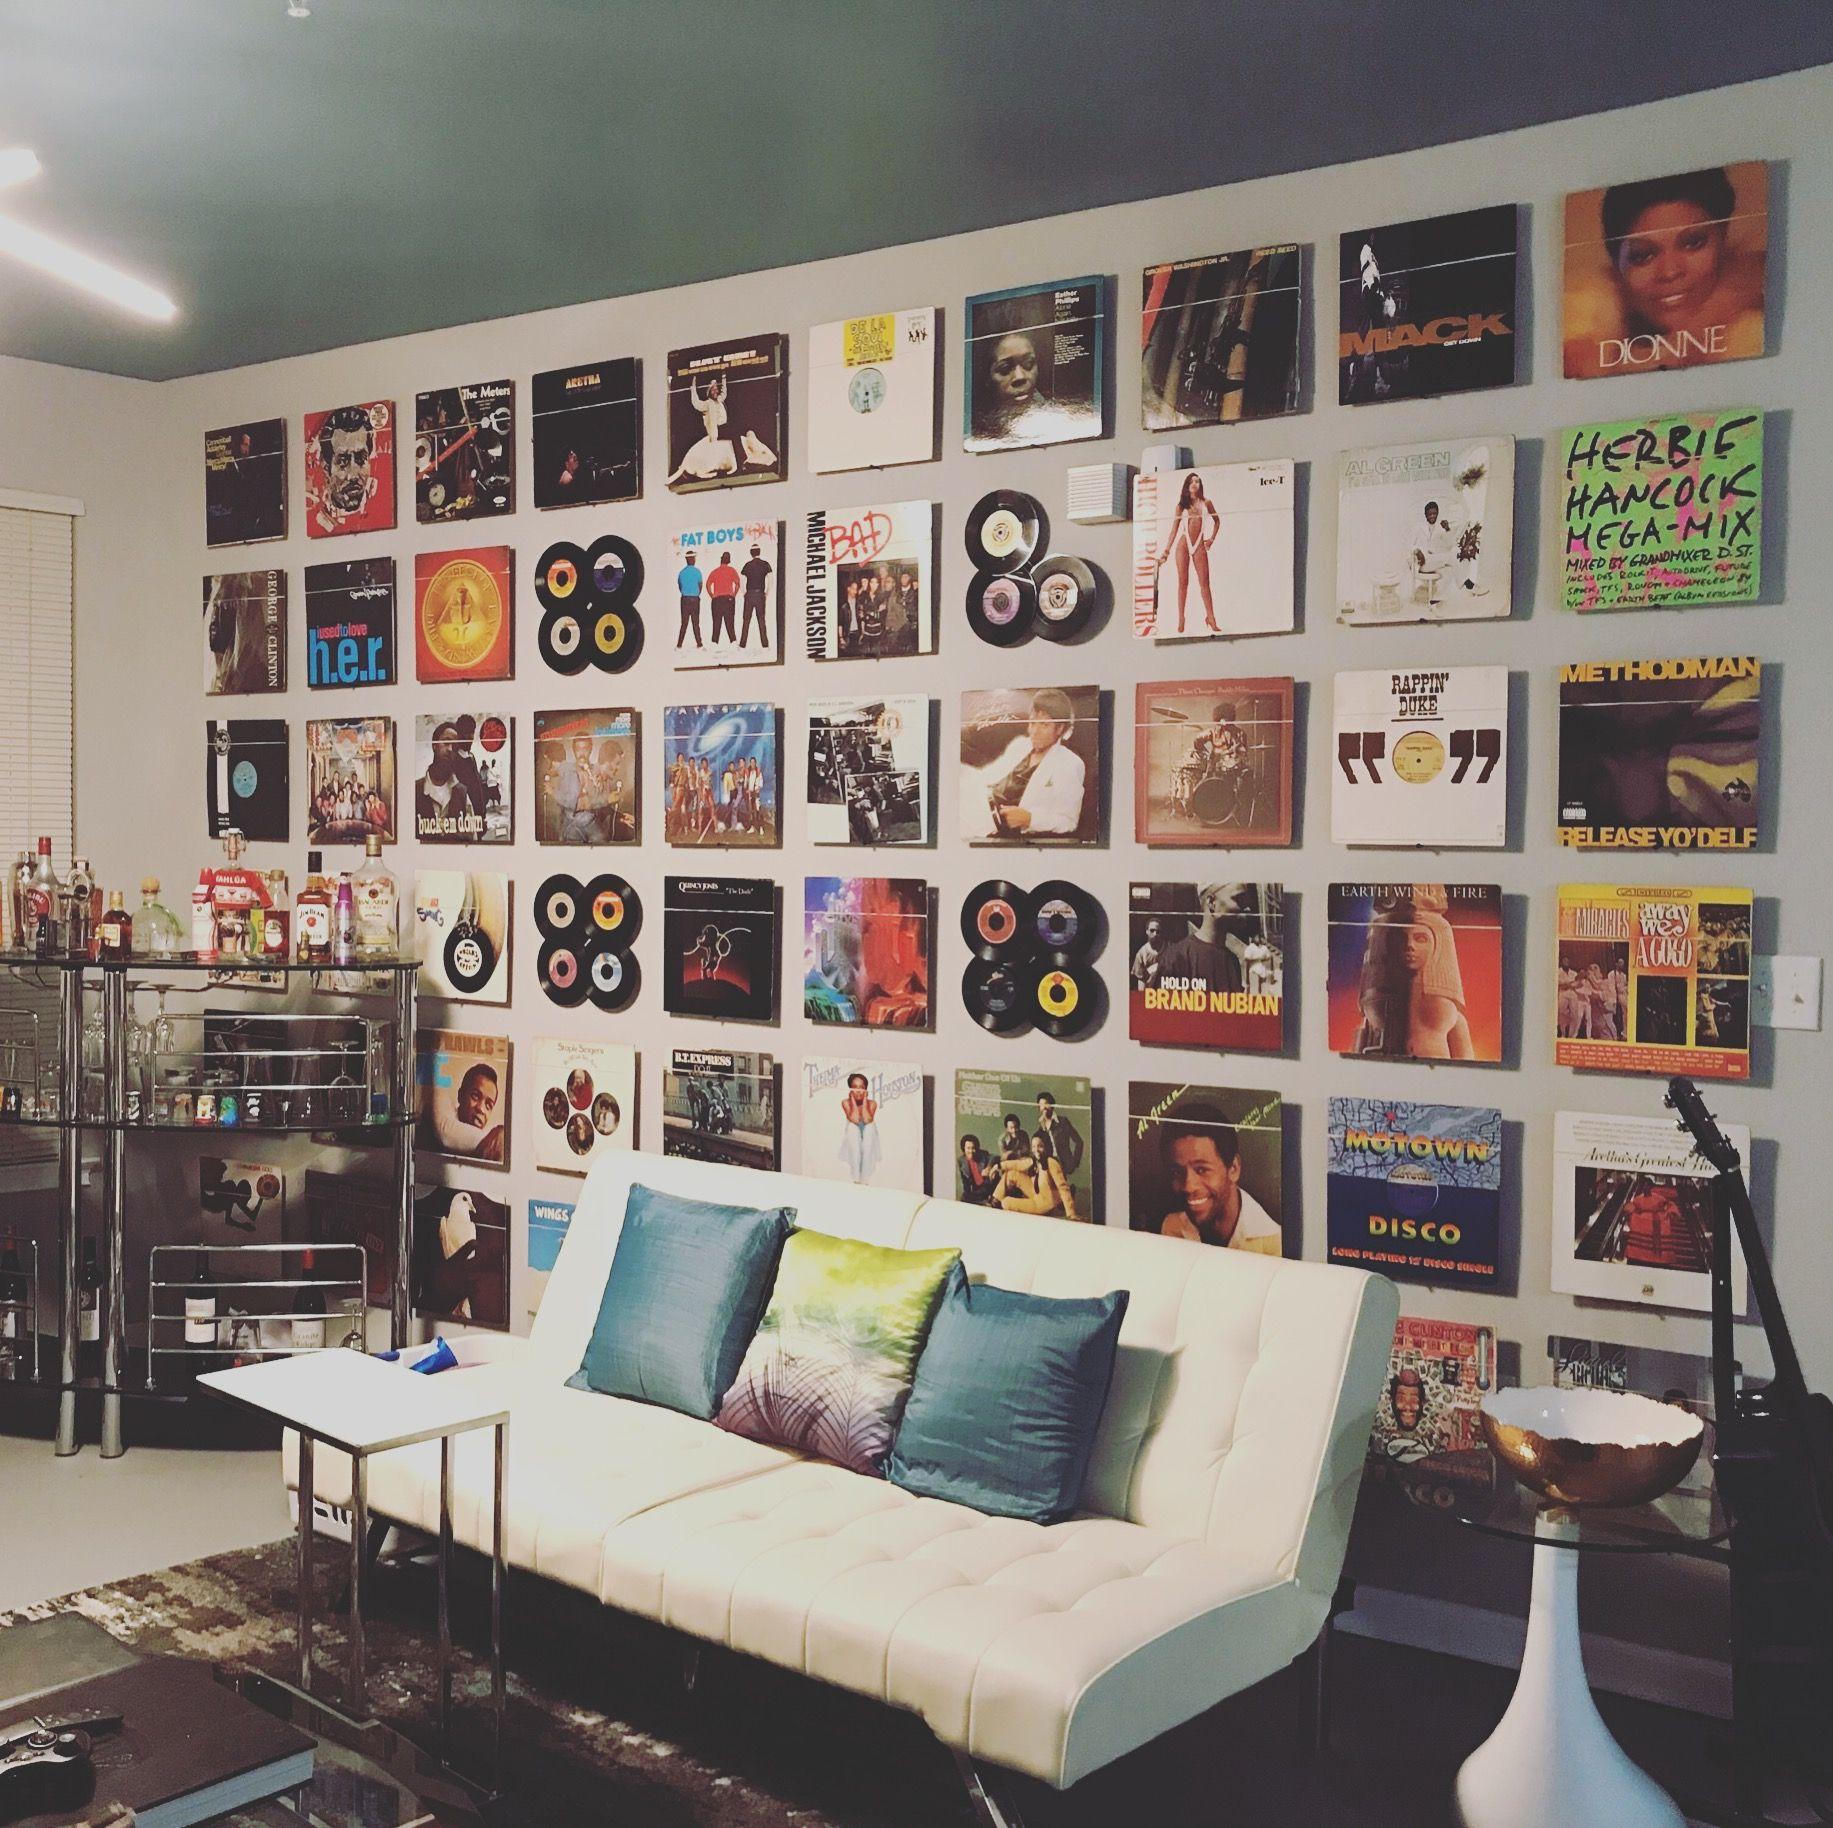 Vinyl Record Tribute Wall Record Wall Decor Vinyl Room Vinyl Record Room